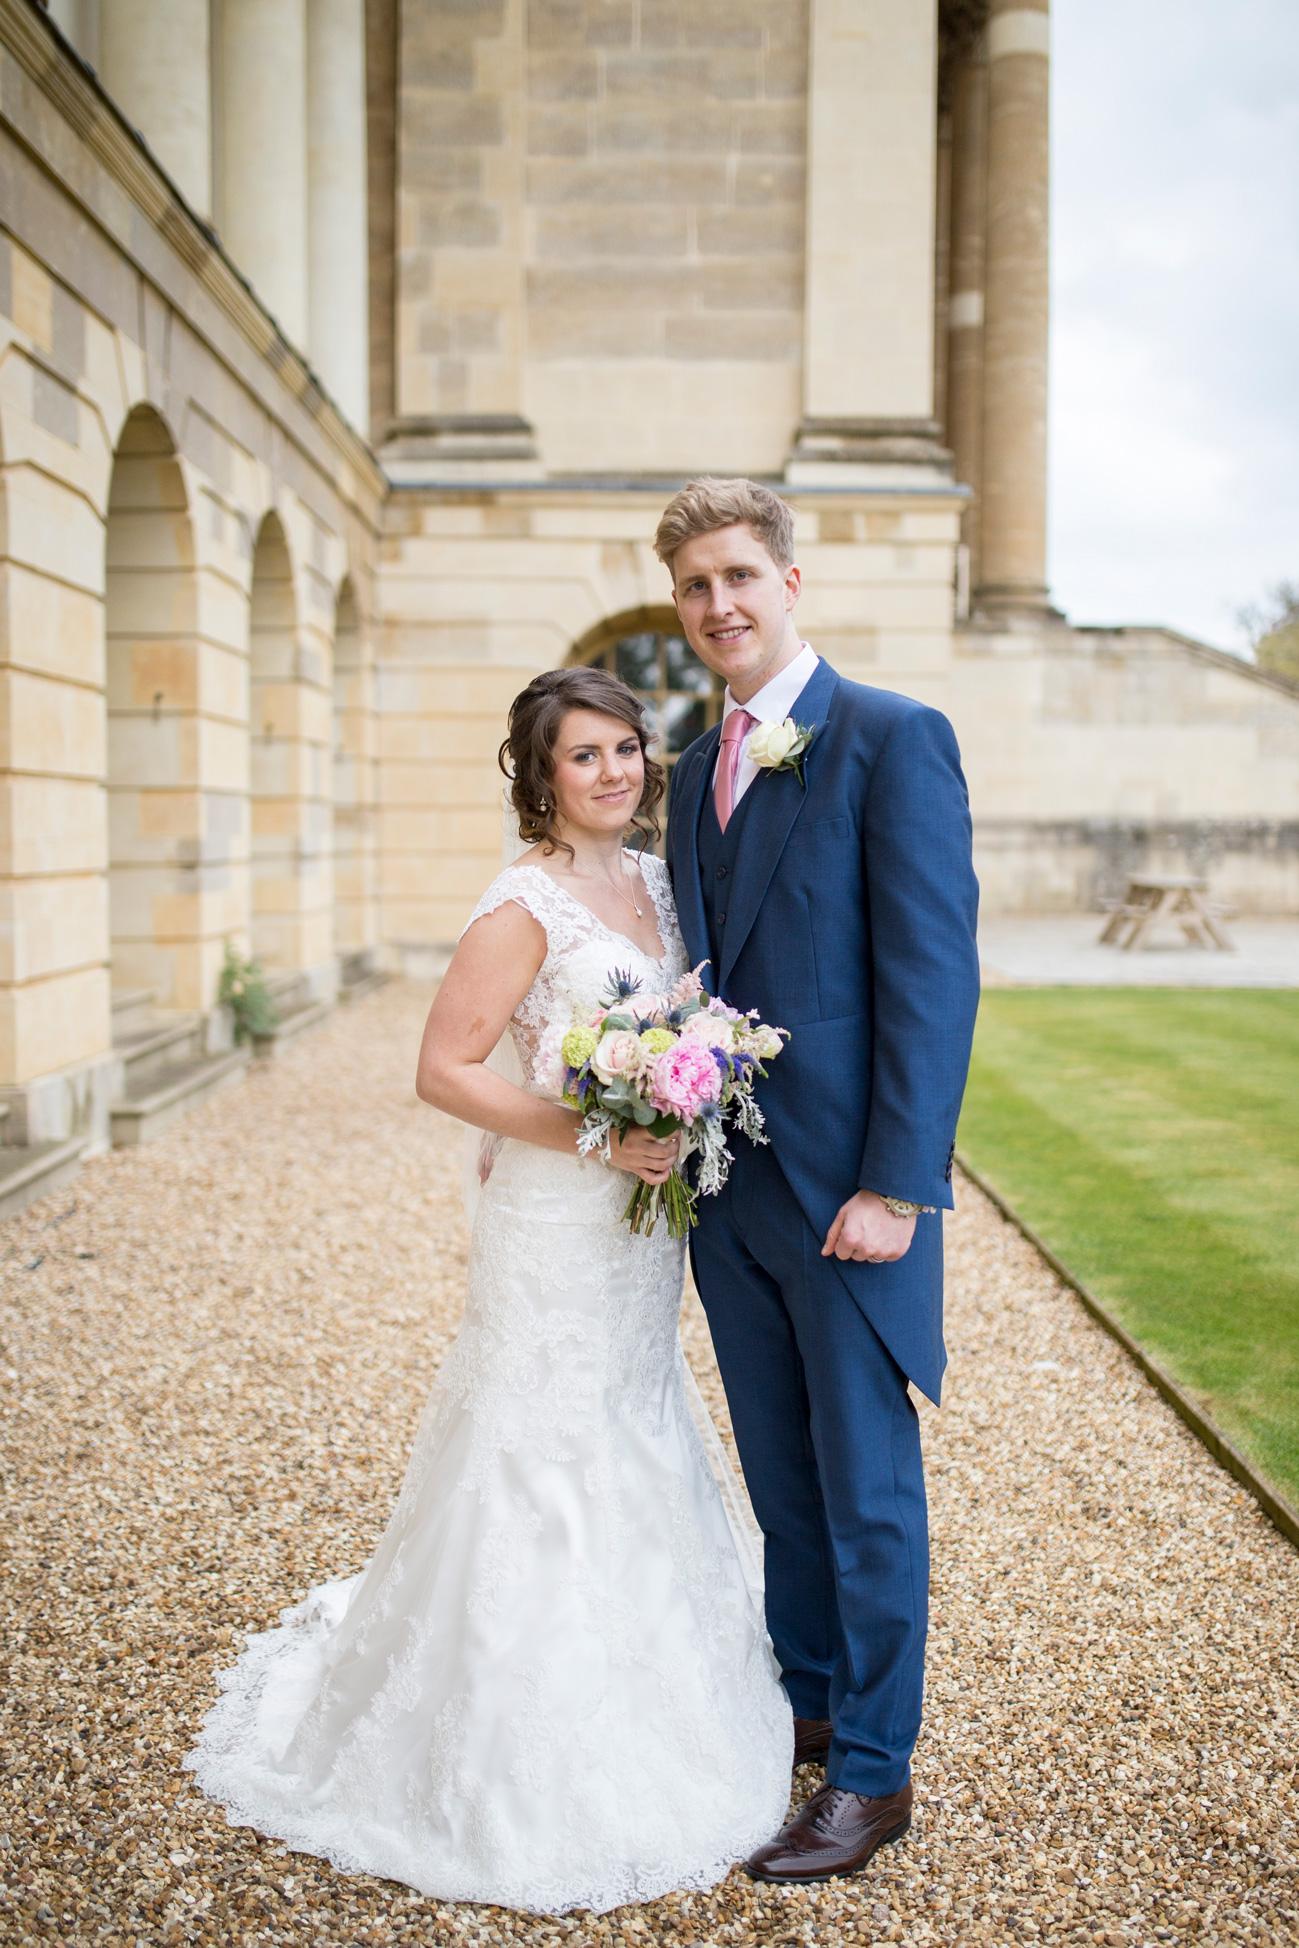 Stowe School, Luxe Wedding, Home Counties Wedding,